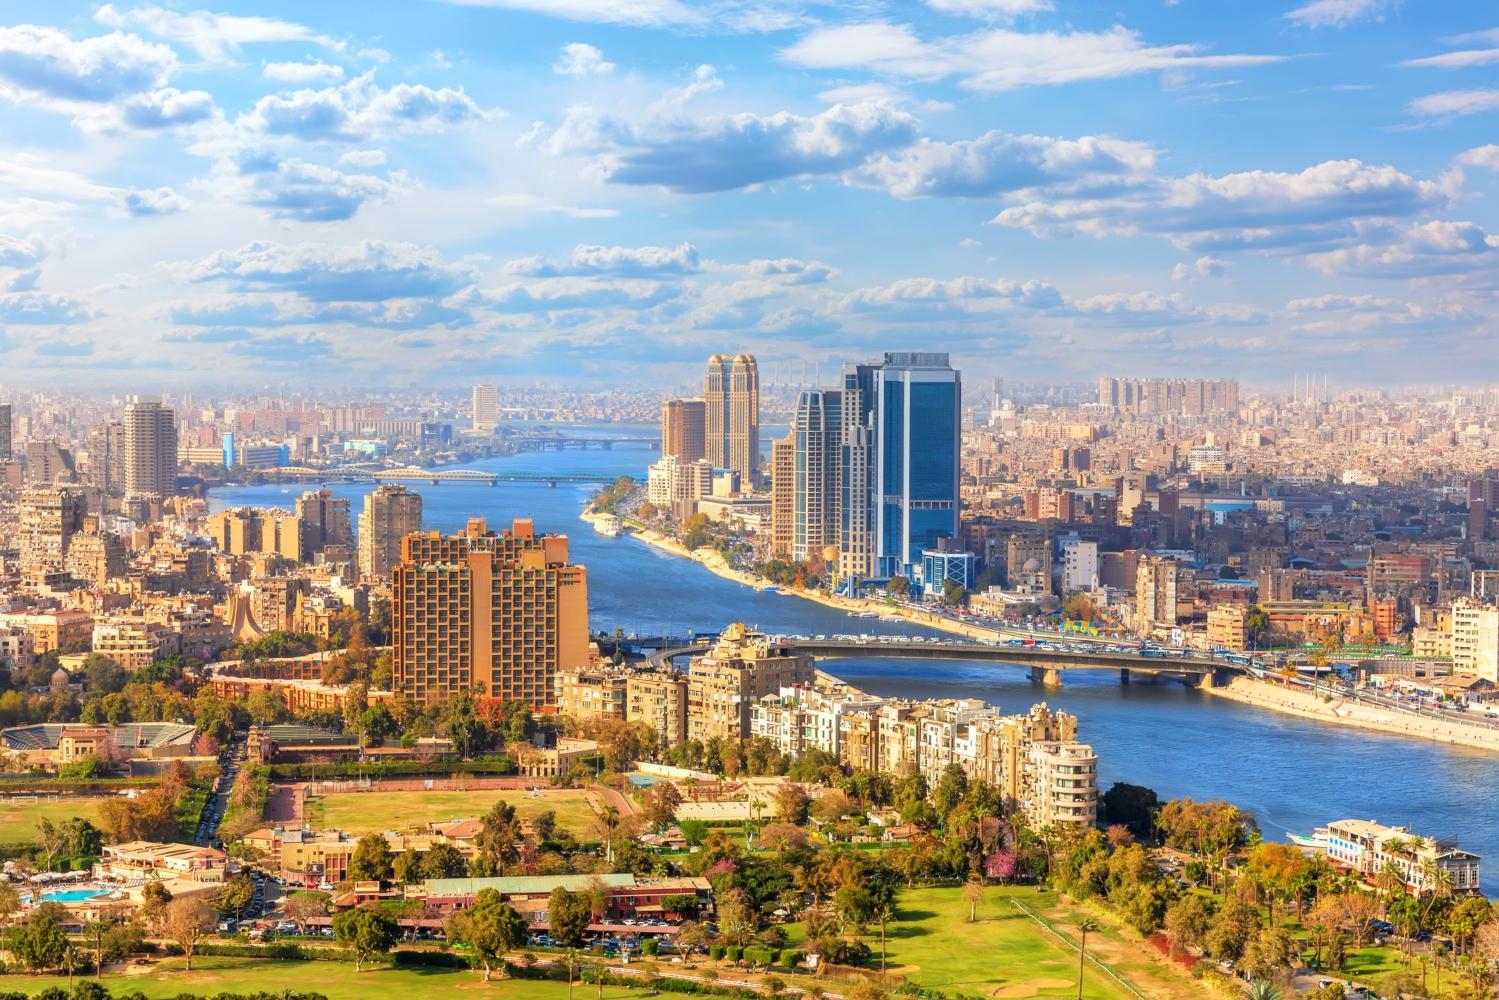 Vista da cidade do Cairo